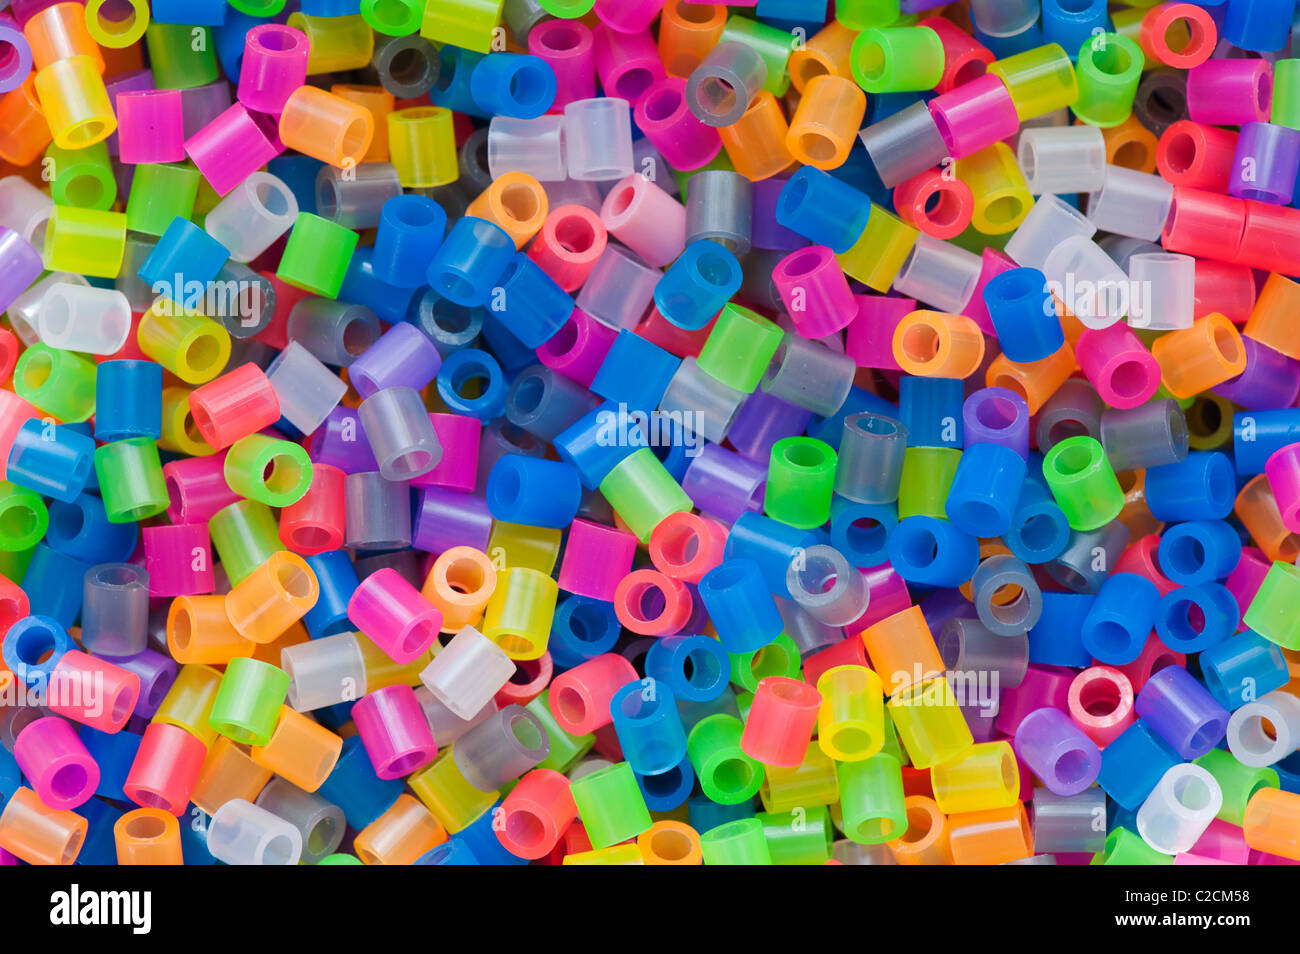 Multicoloured replica Hama plastic beads - Stock Image